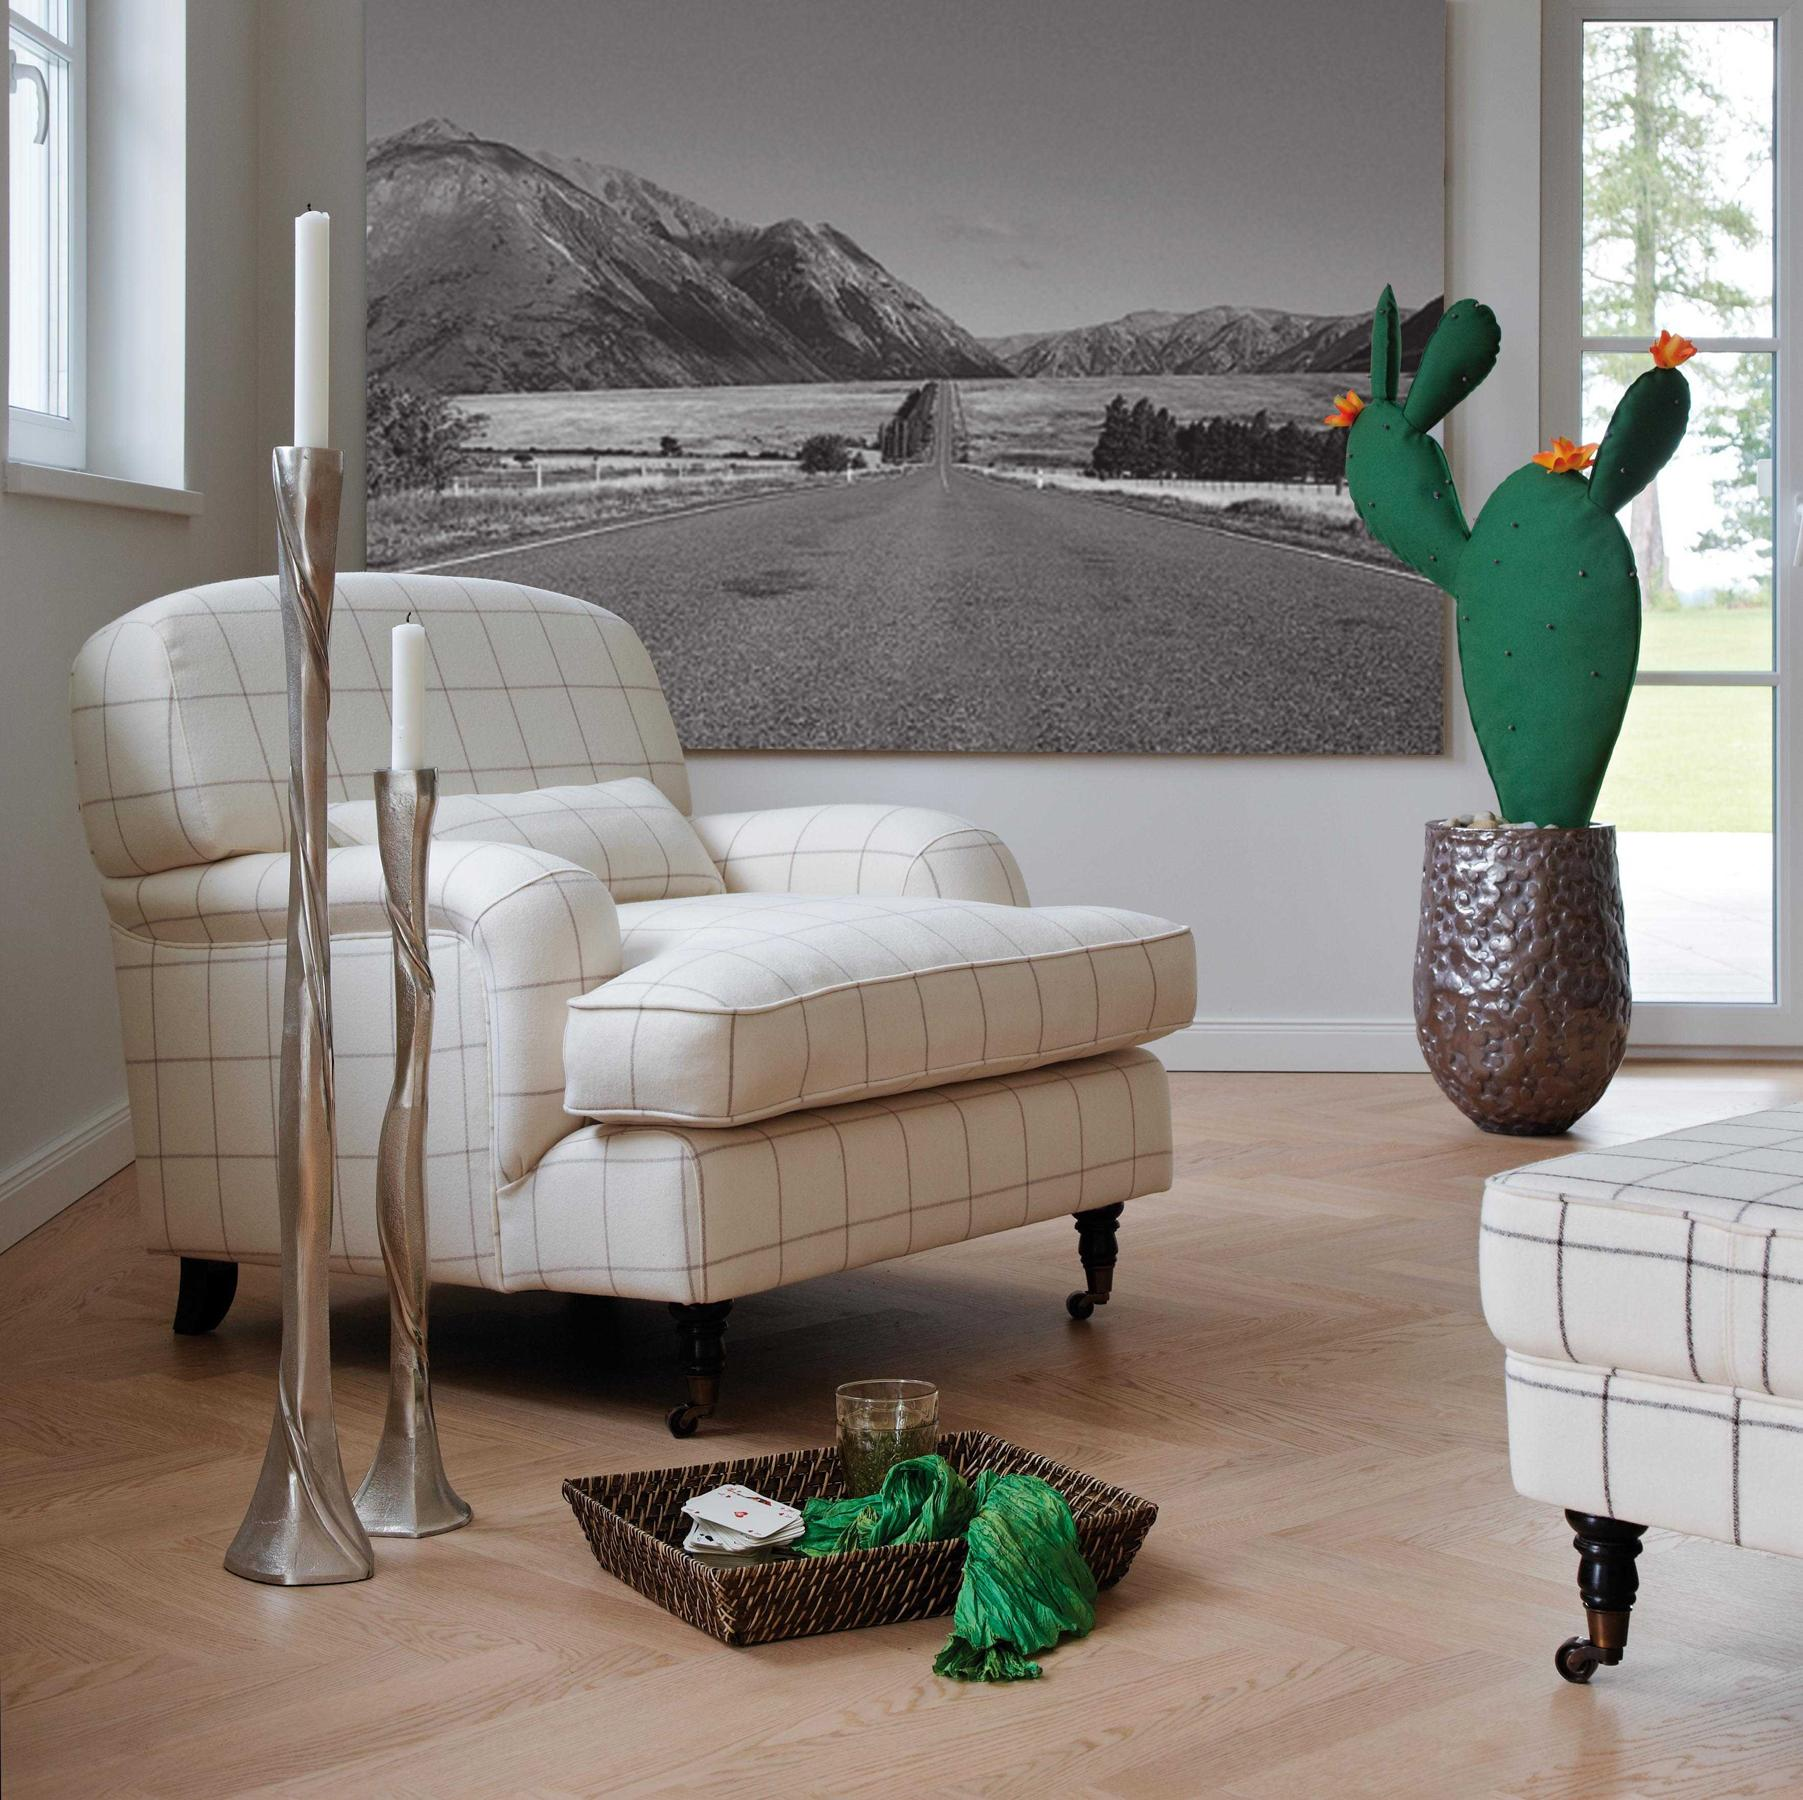 chaiselongue bilder ideen couchstyle. Black Bedroom Furniture Sets. Home Design Ideas